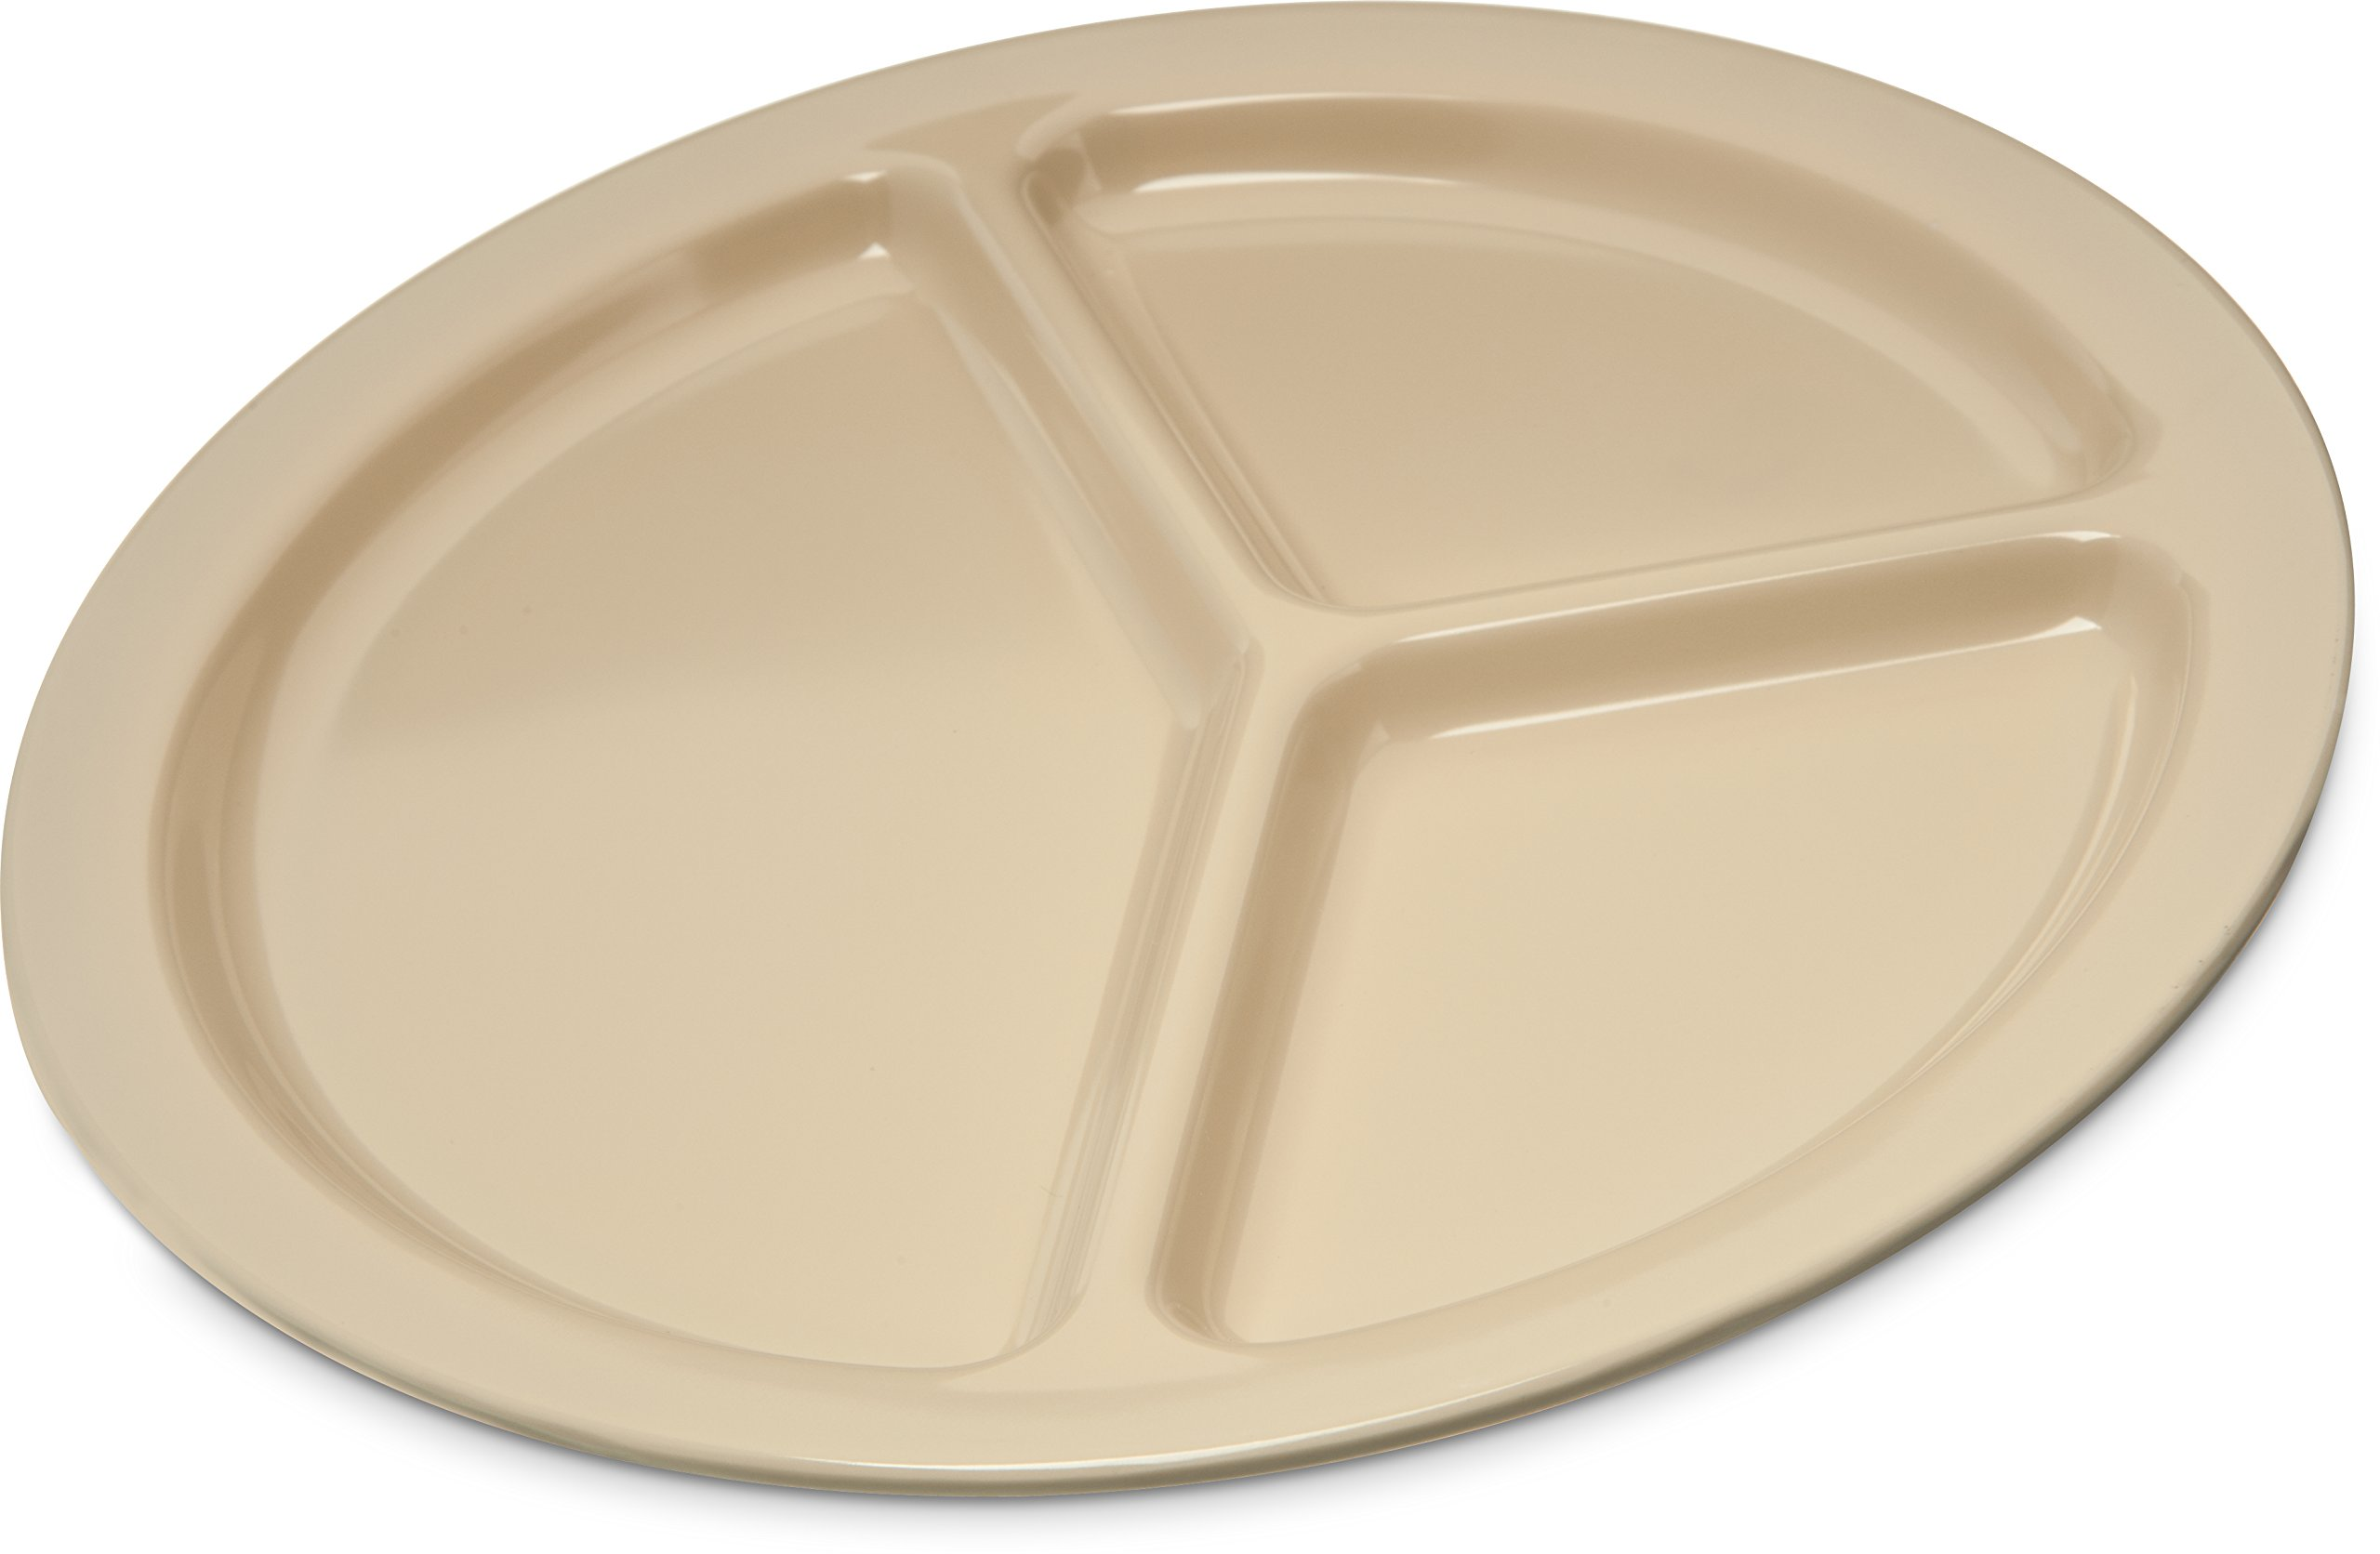 Carlisle KL10225 Kingline Melamine 3-Compartment Plate, 10'', Tan (Pack of 48)